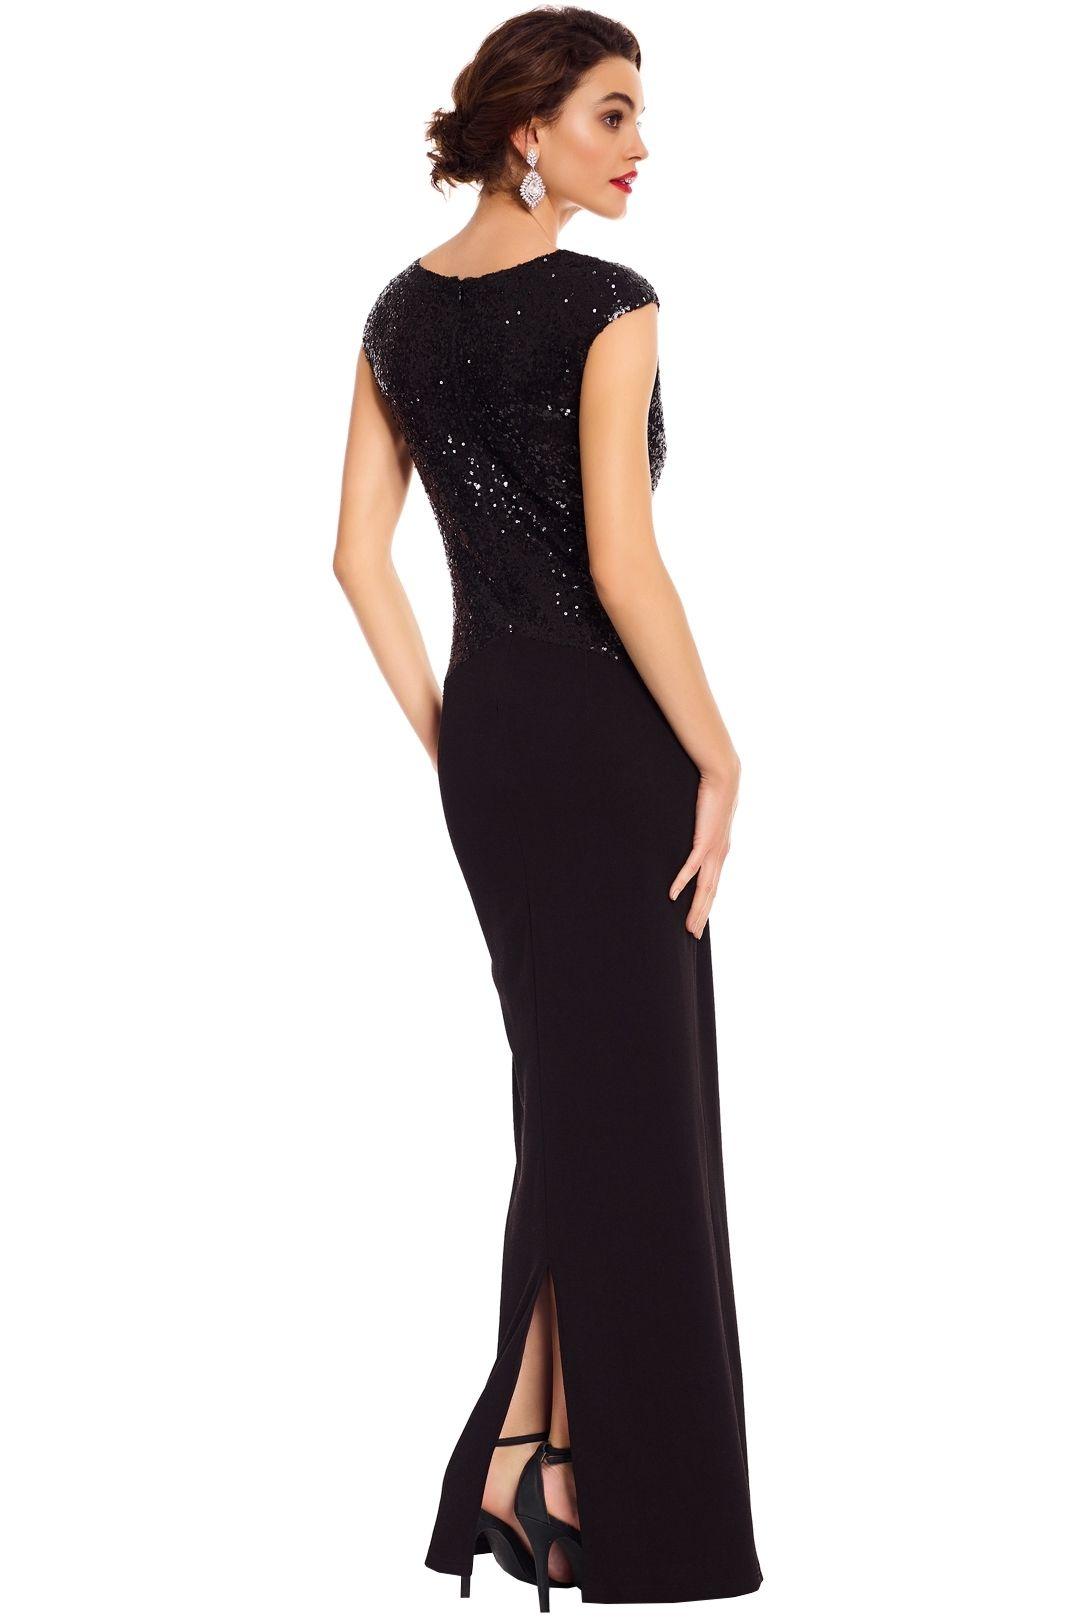 Elle Zeitoune - Ruby Black Gown - Black - Back